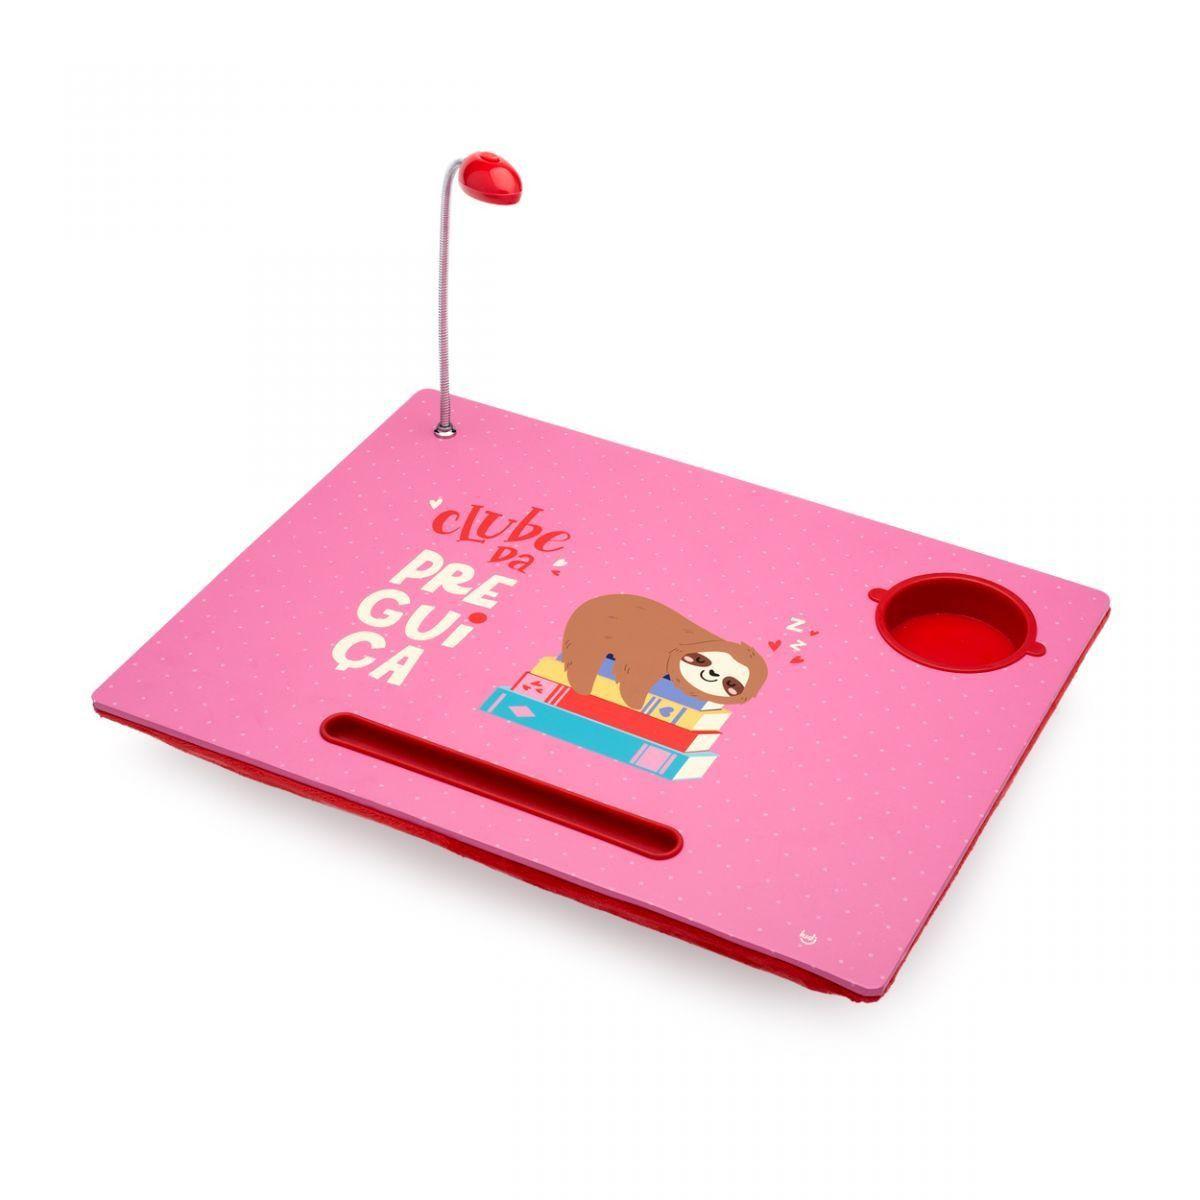 Bandeja Laptop Bicho Preguiça